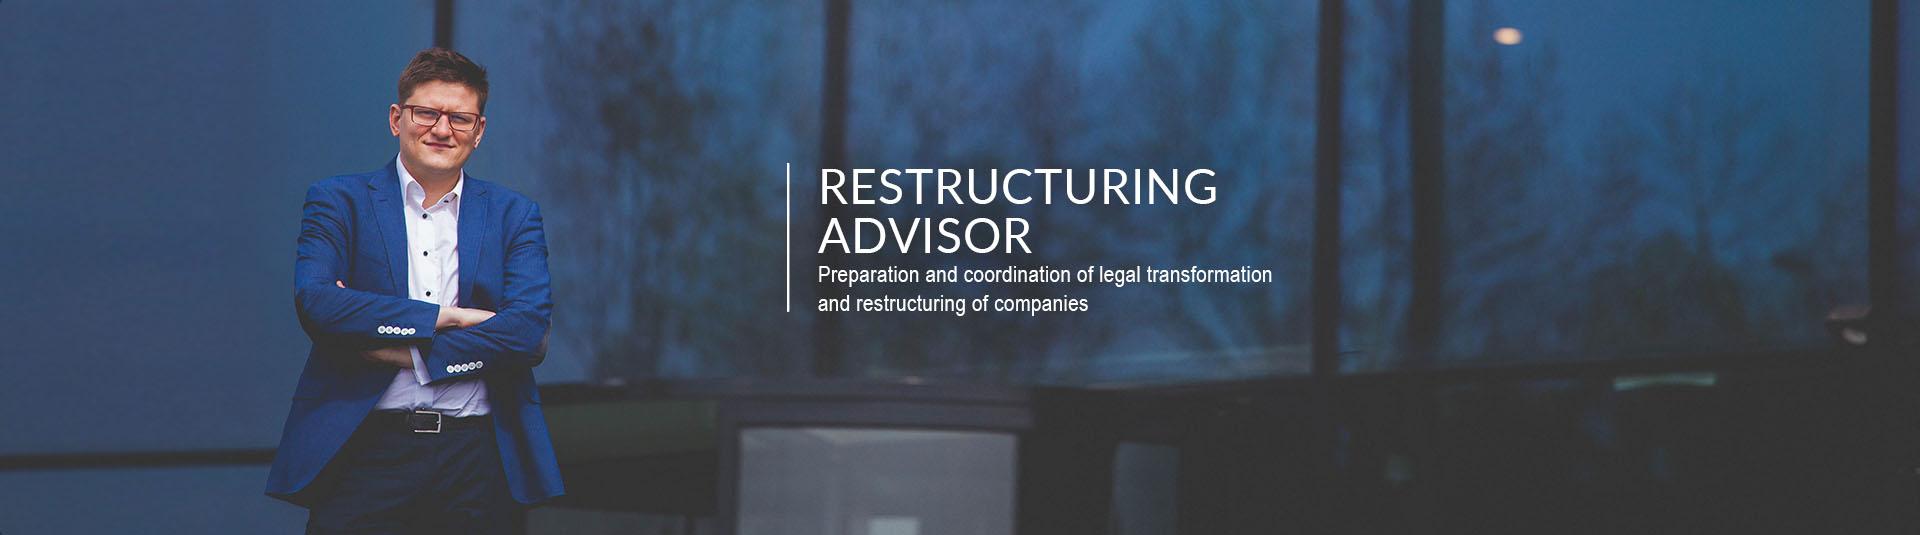 Restructuring advisor